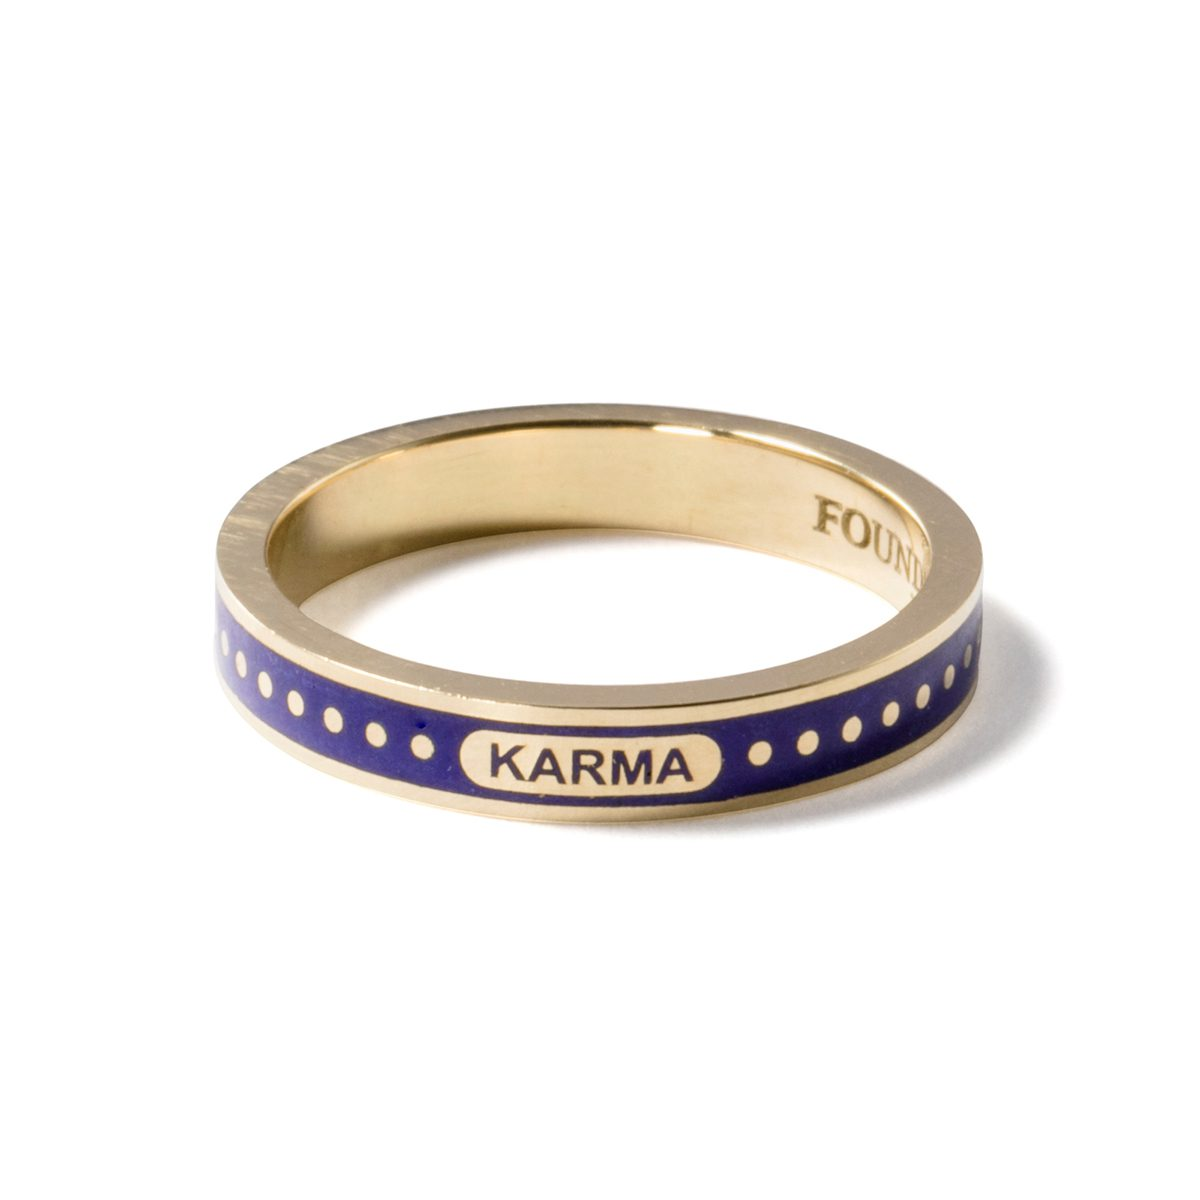 FOUNDRAE - KARMA|Rings